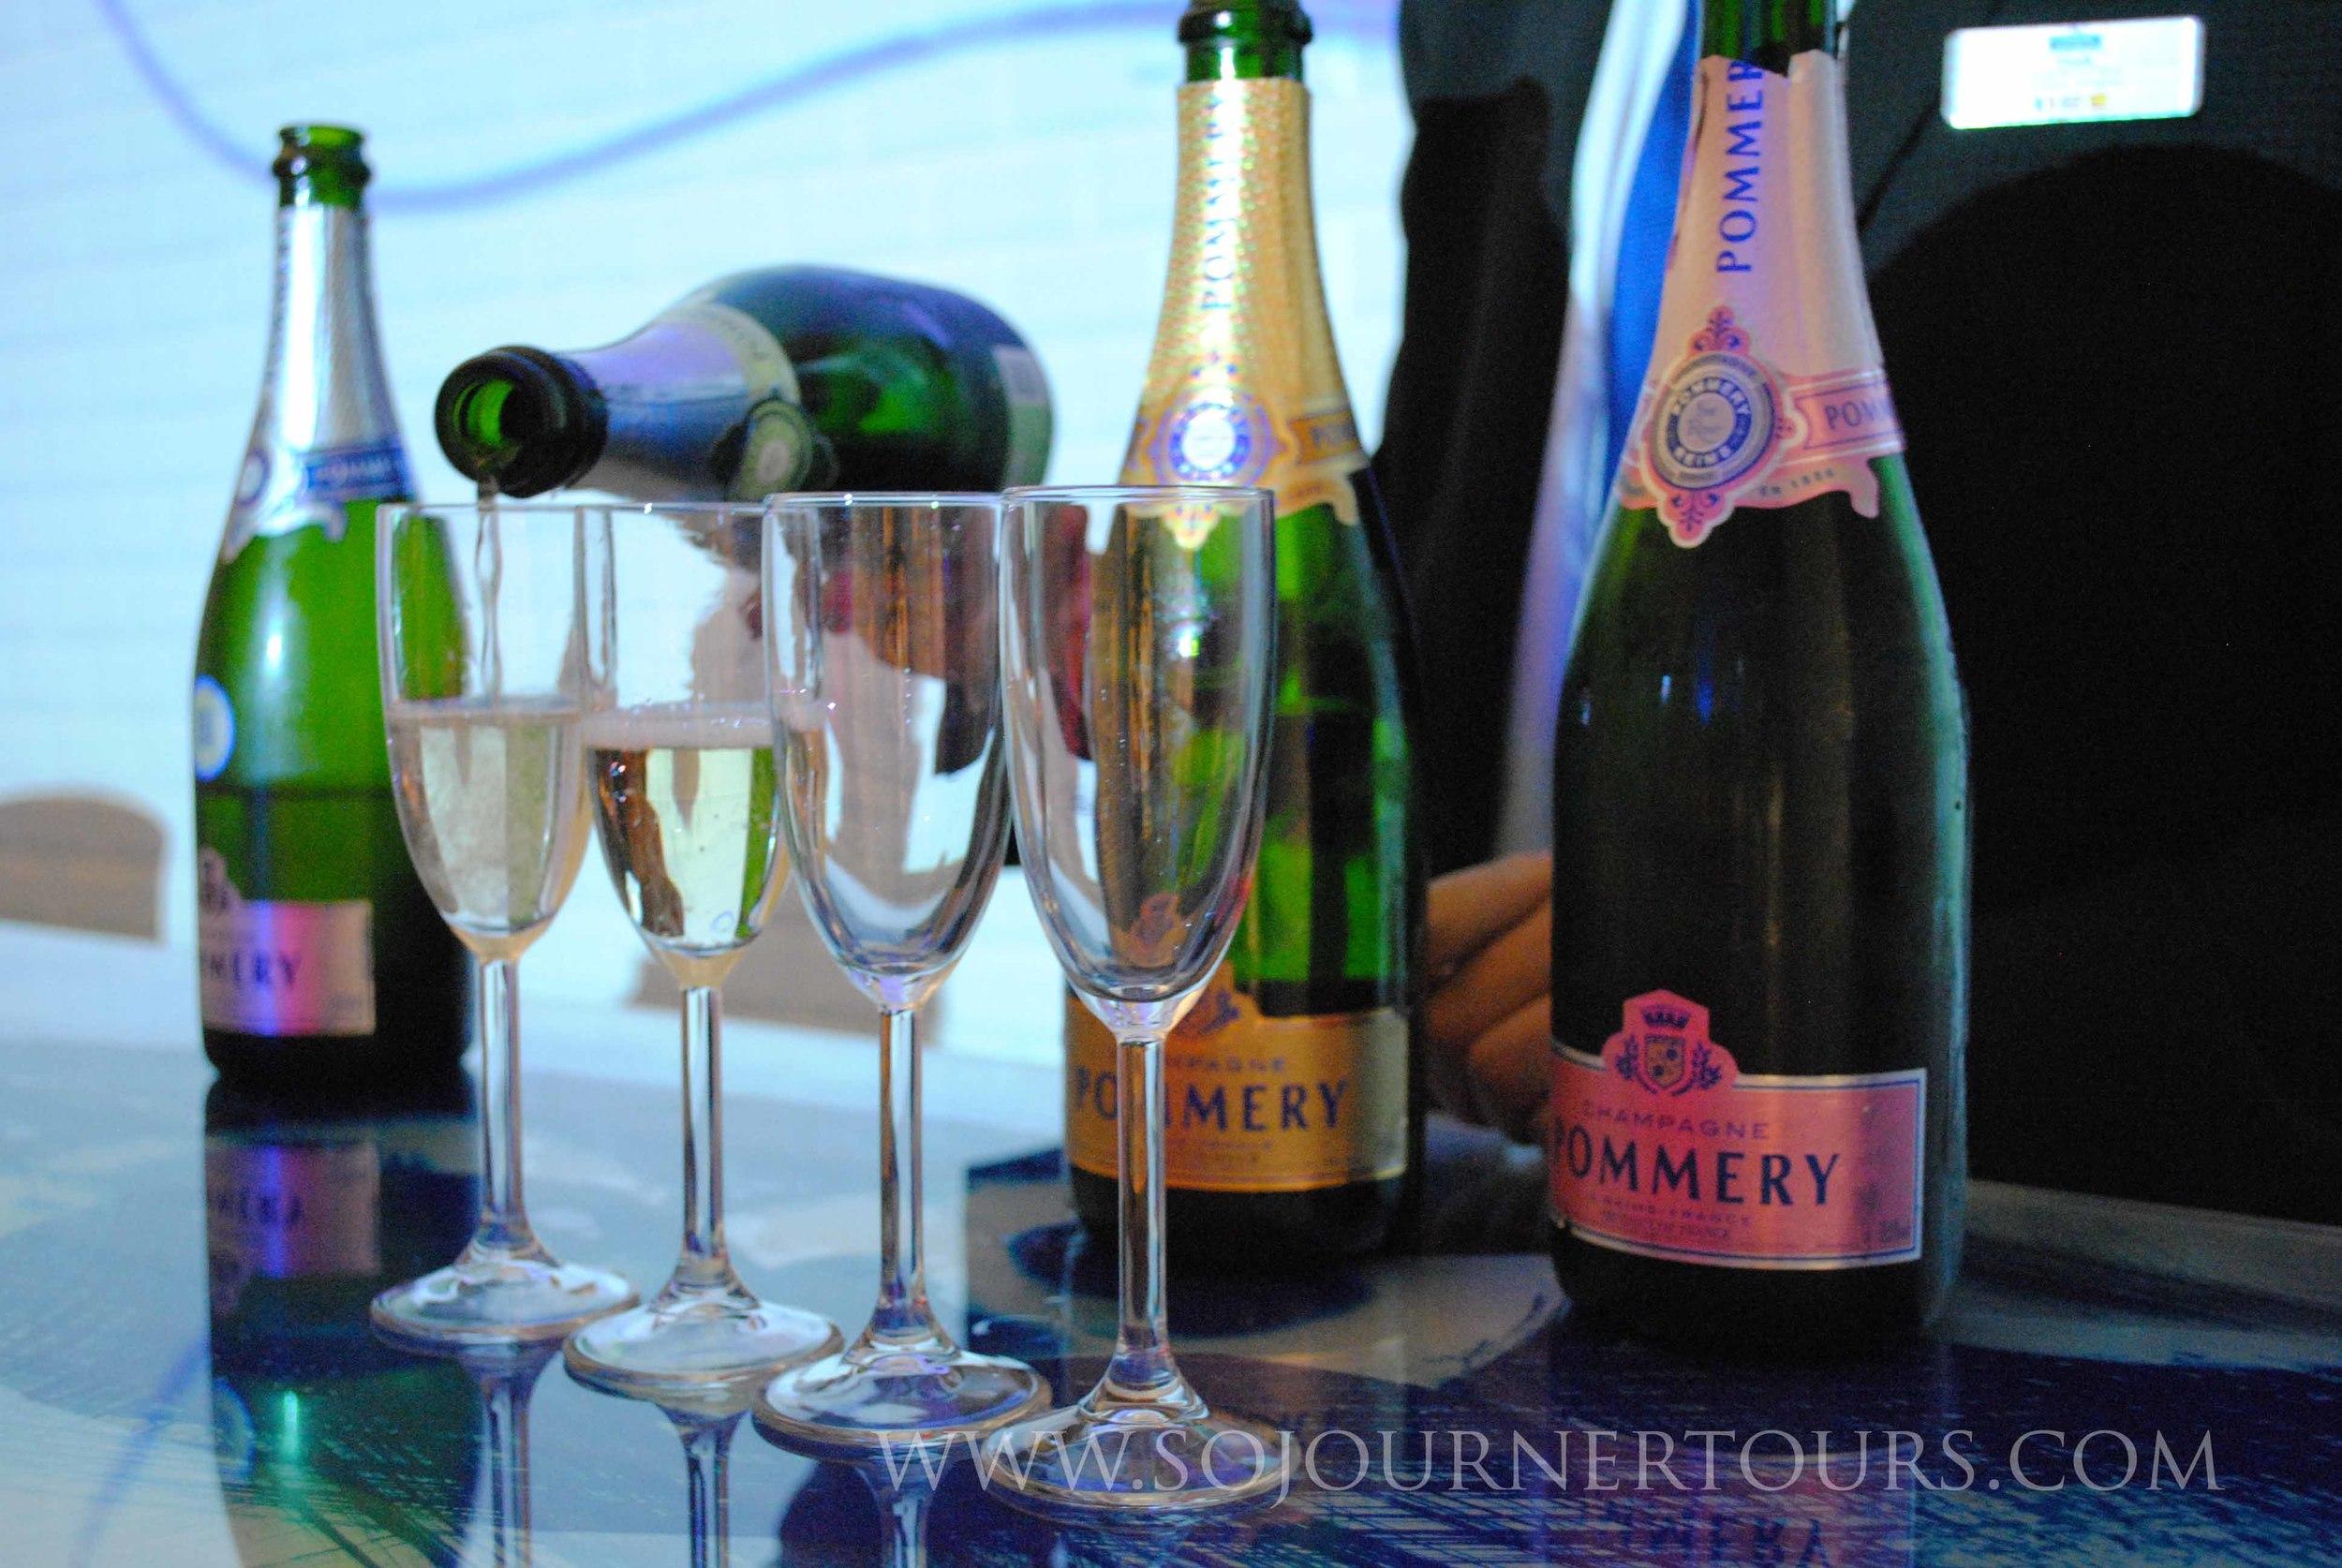 Sampling some champagne.